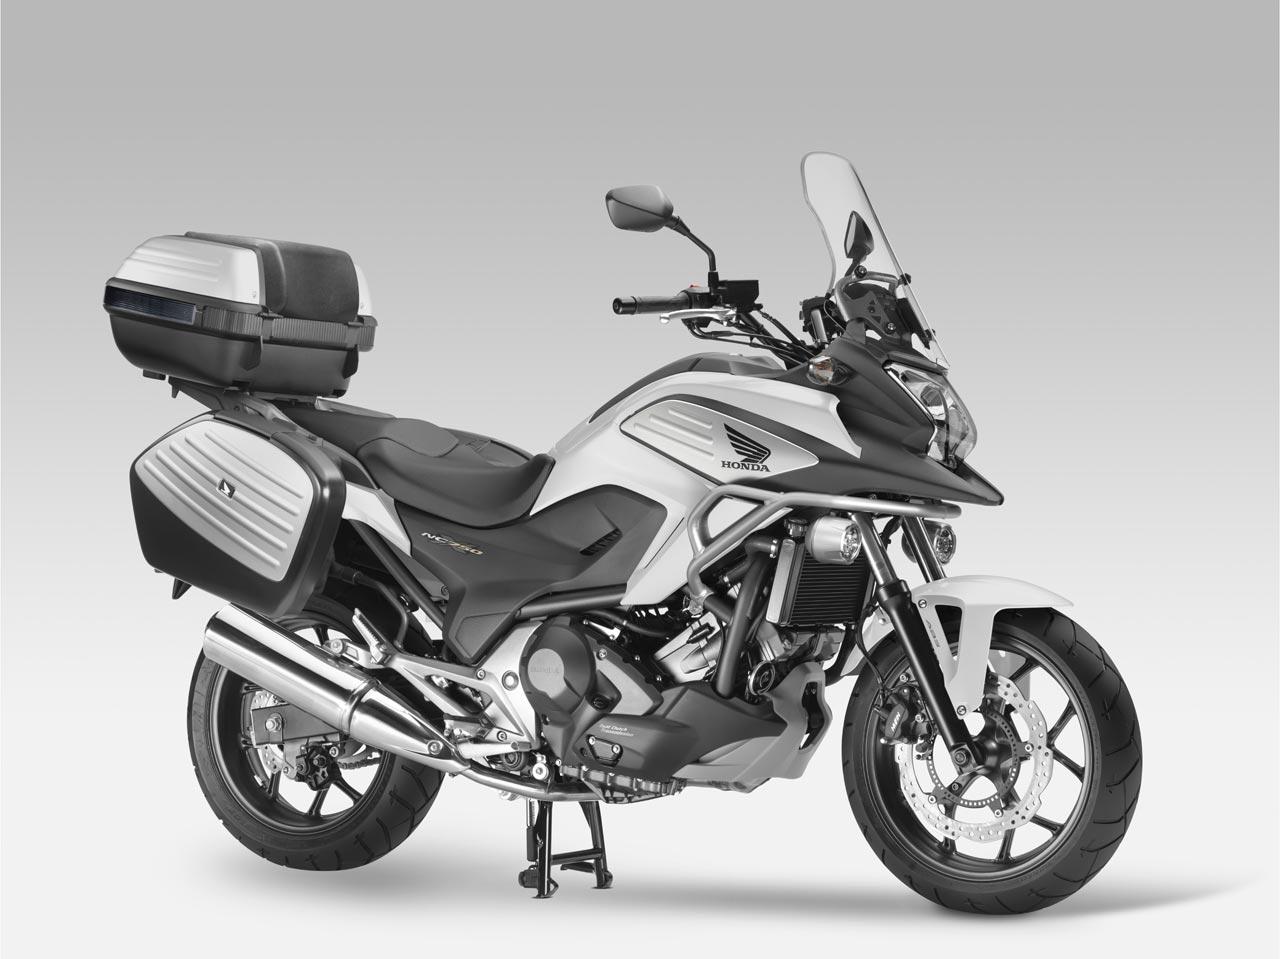 Nuova Honda NC750X Travel Edition